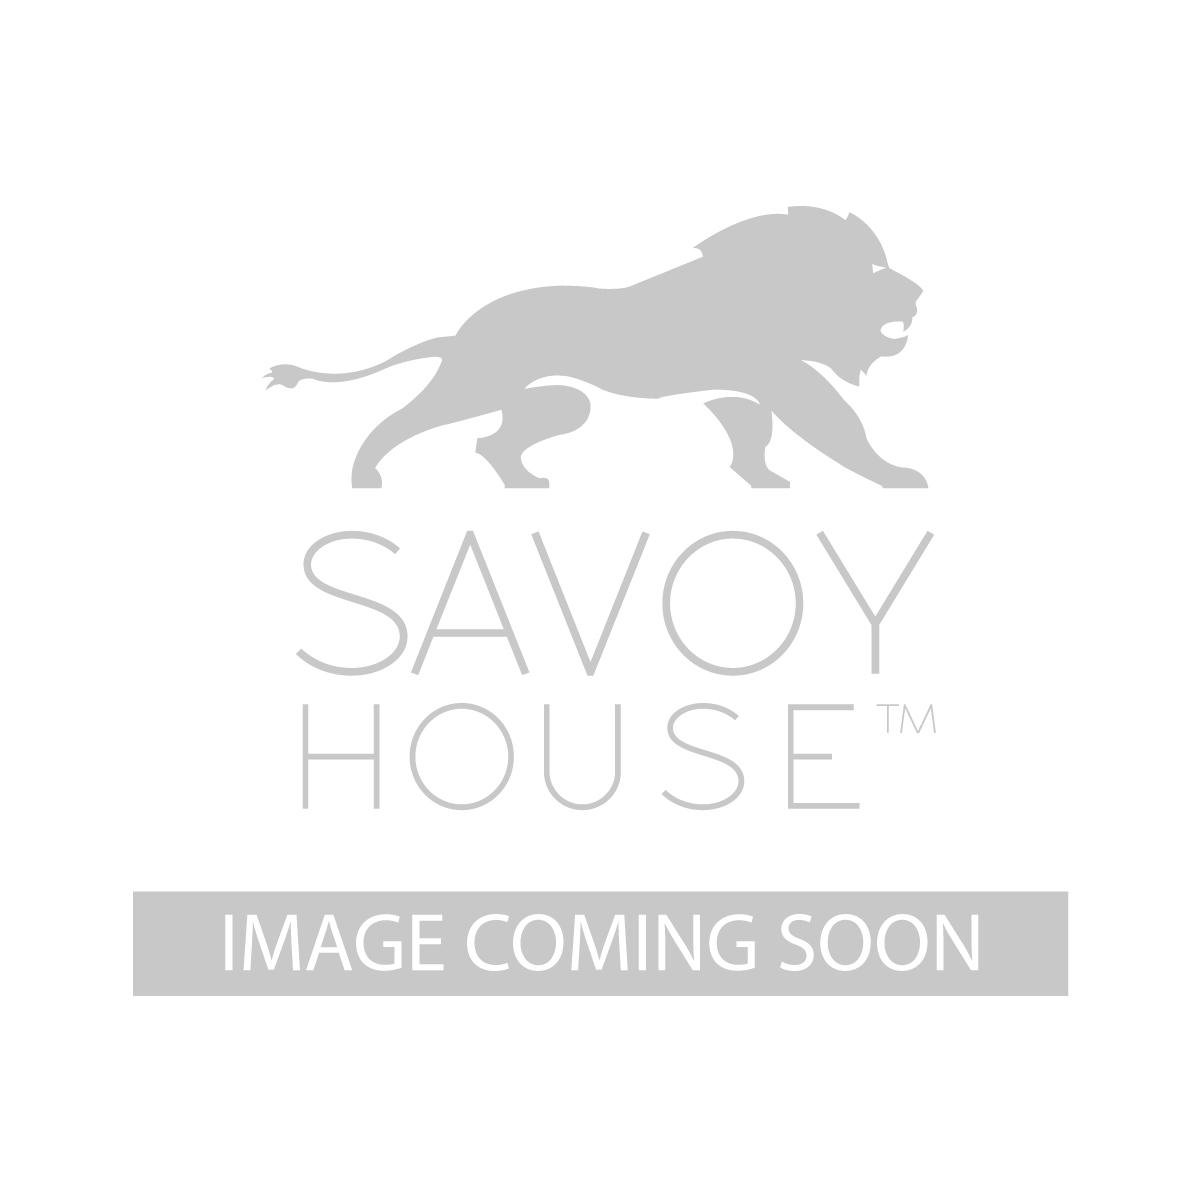 5 301 78 Waterton 11 Watt LED Wall Lantern by Savoy House